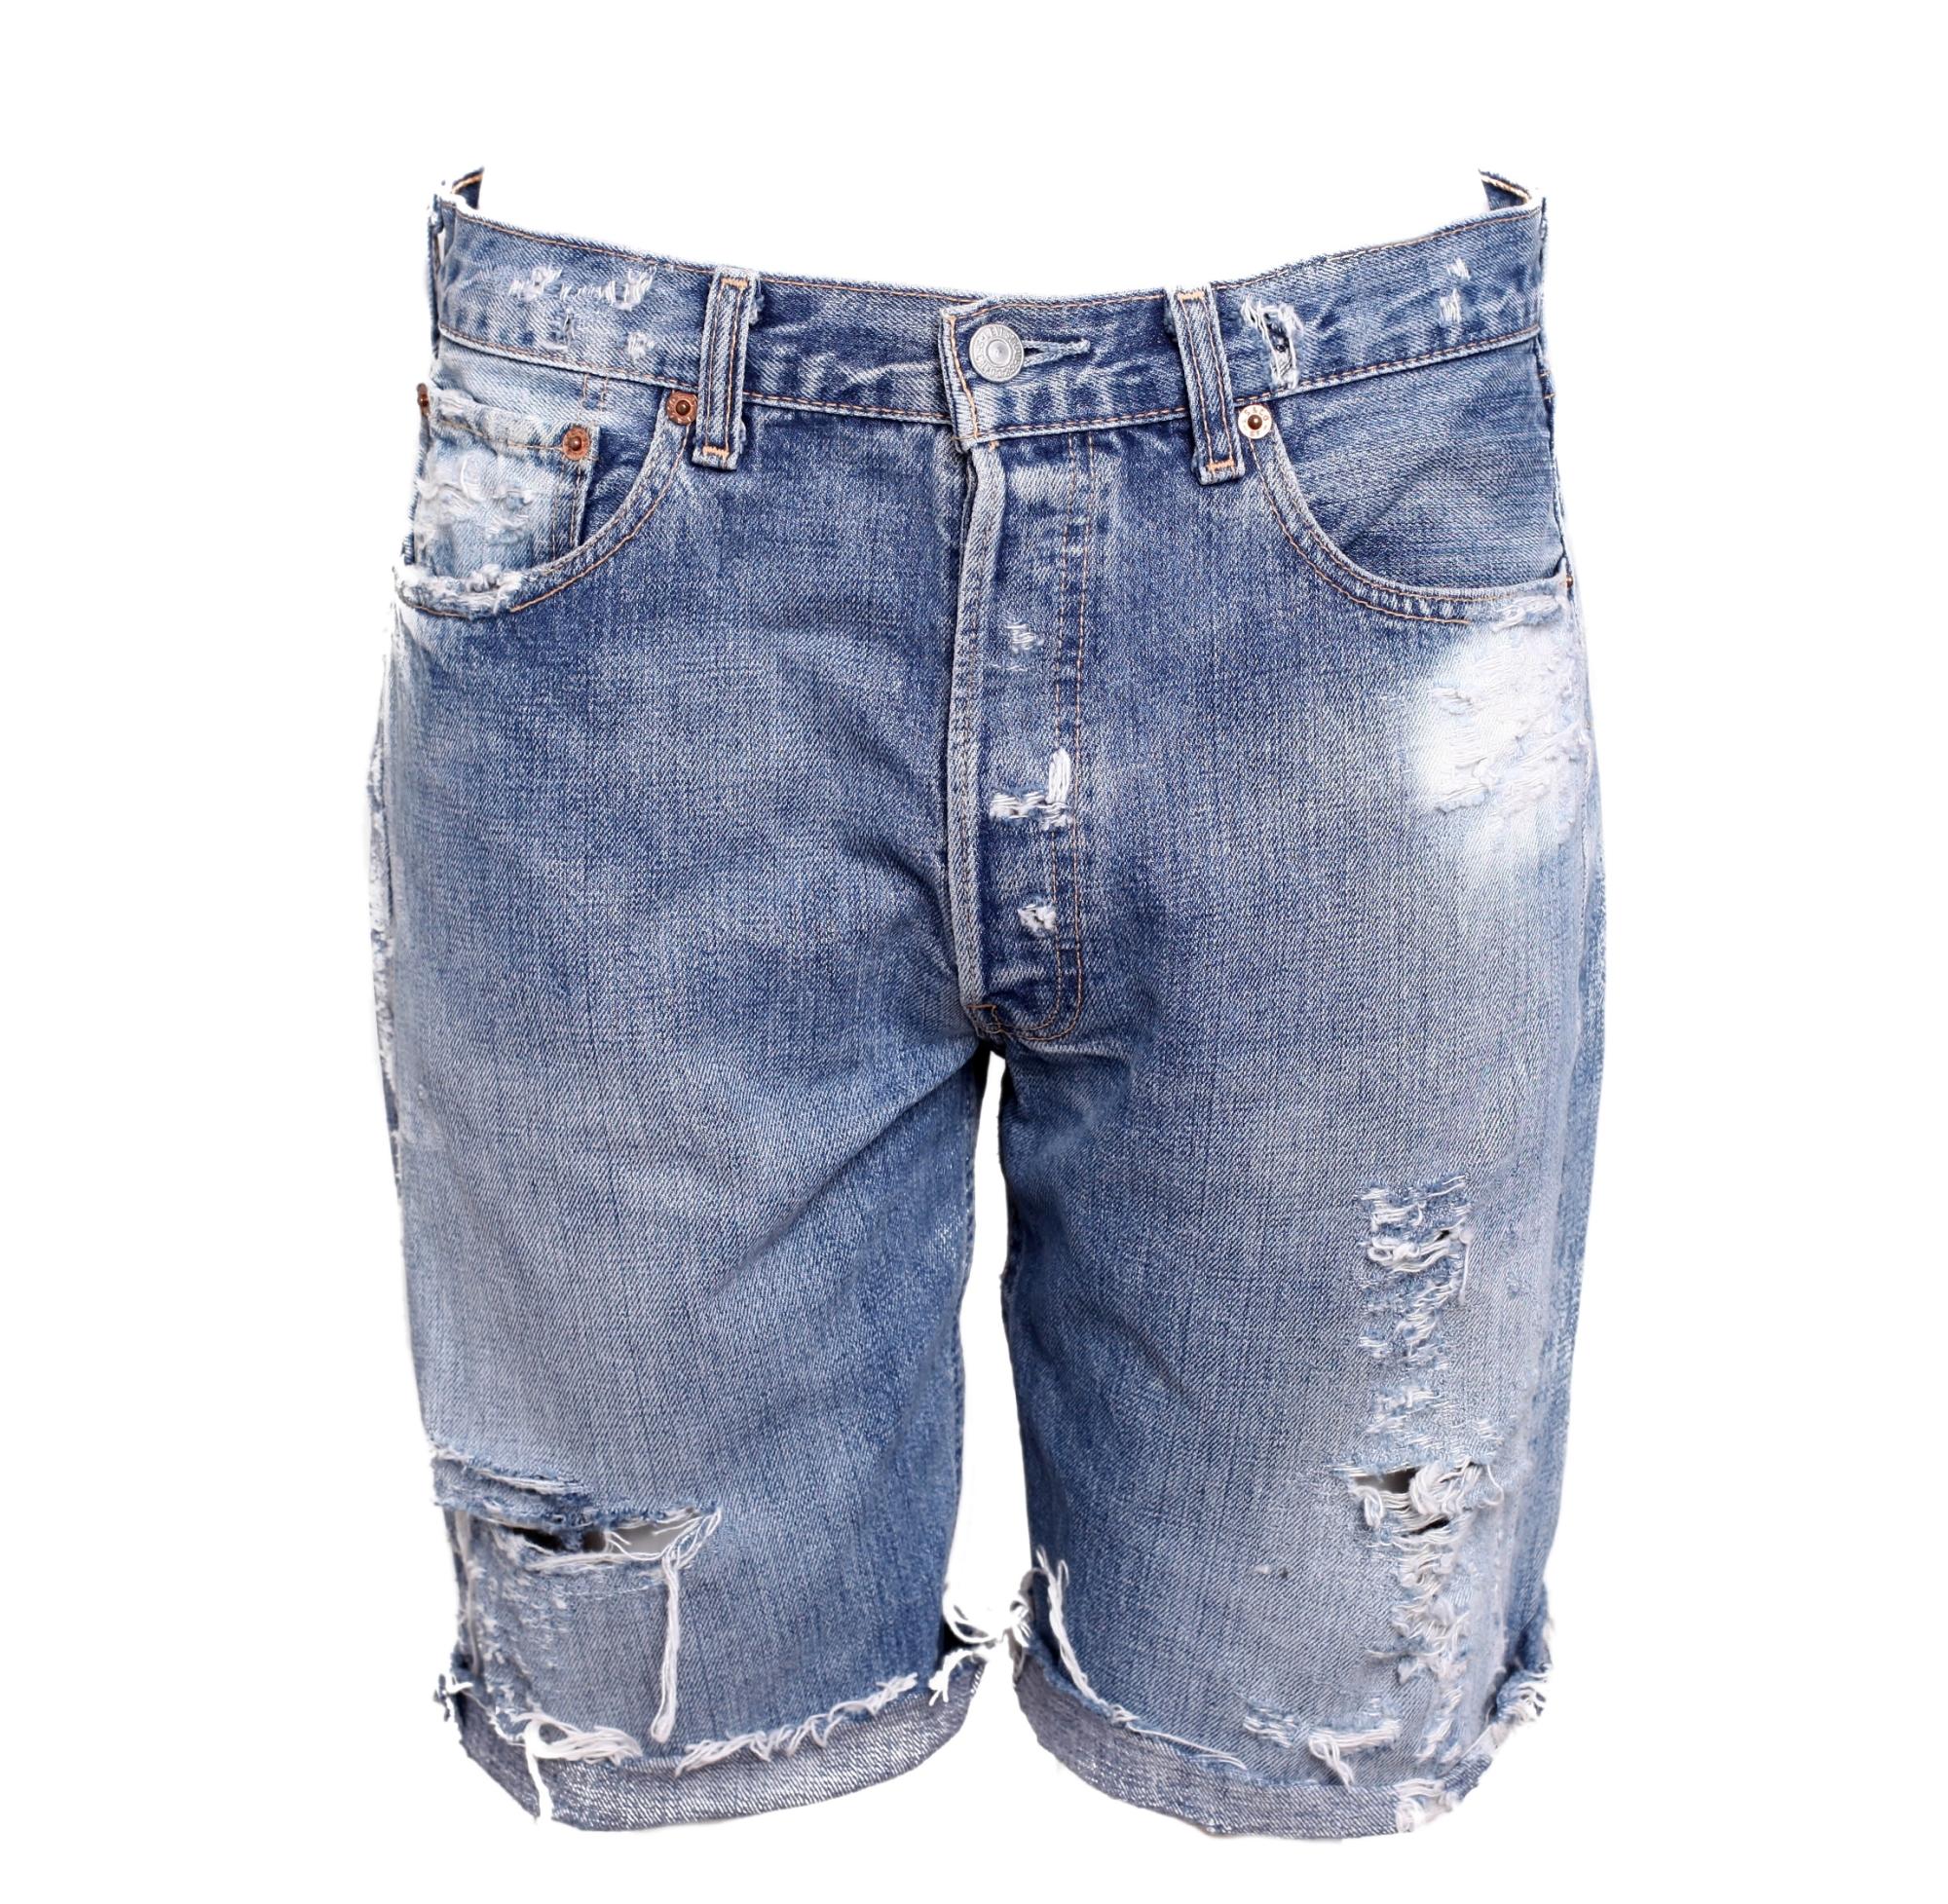 Distressed Jean Shorts Men